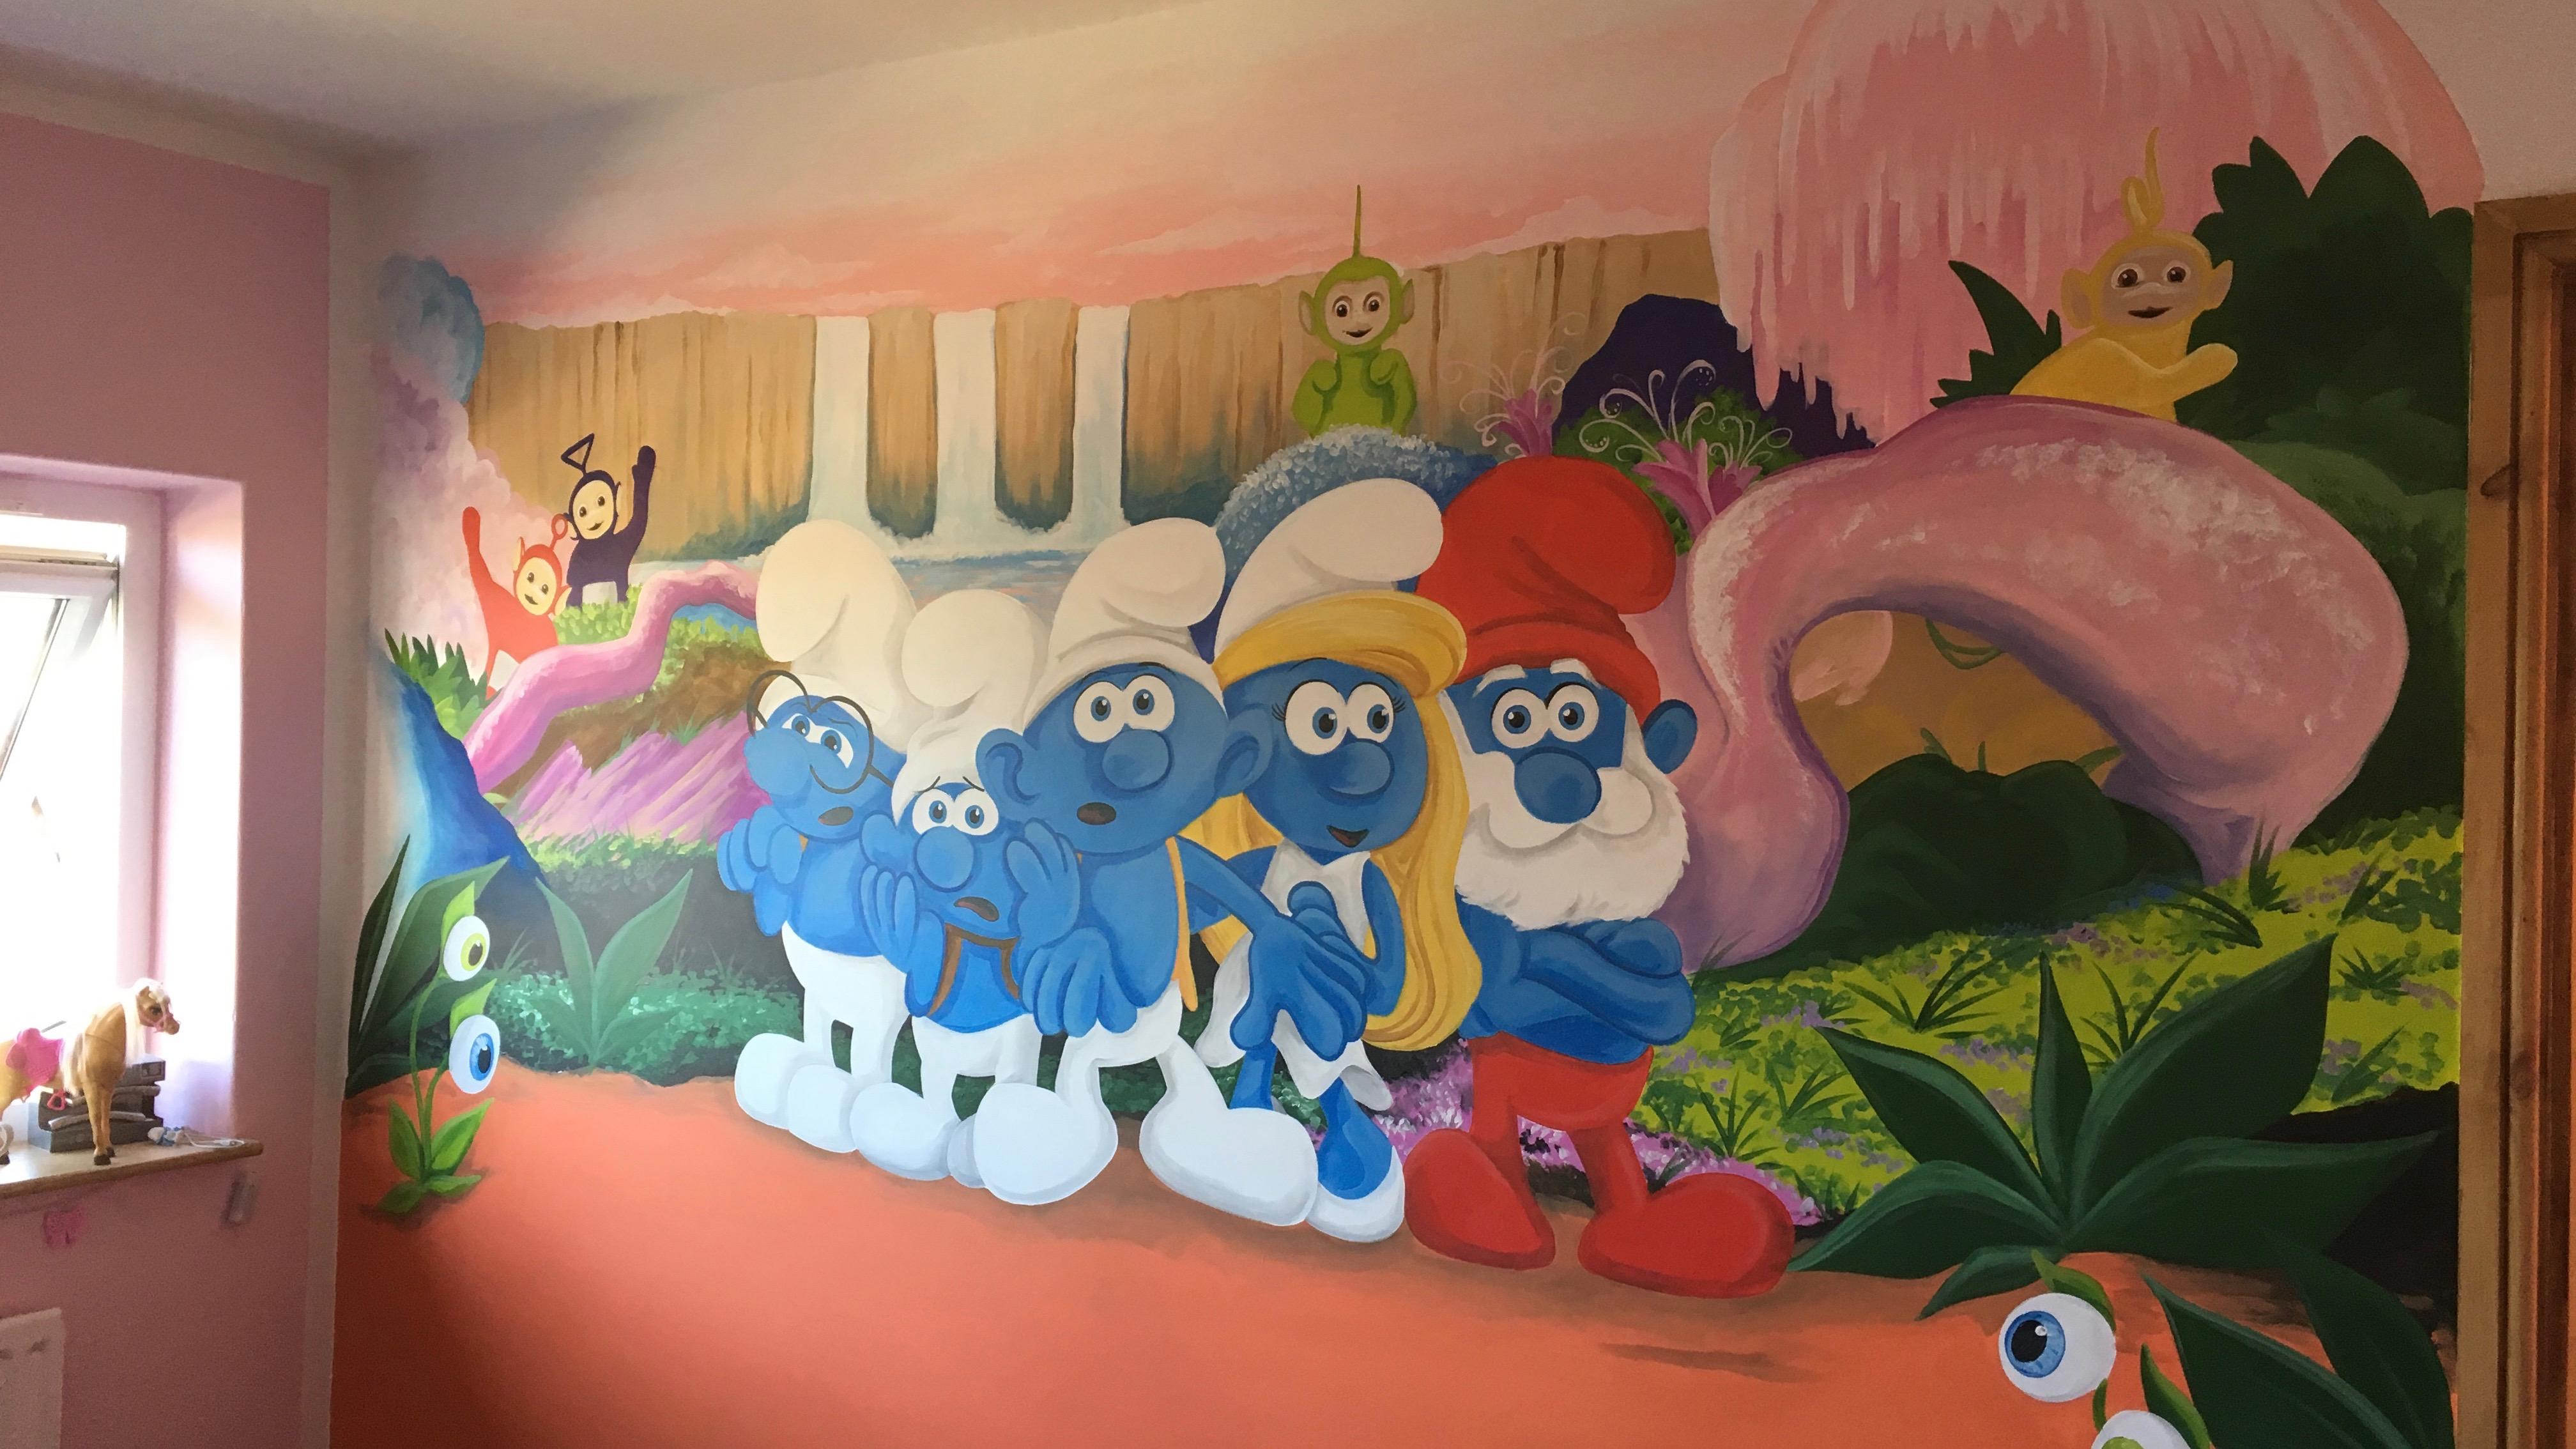 Smurph's Mural